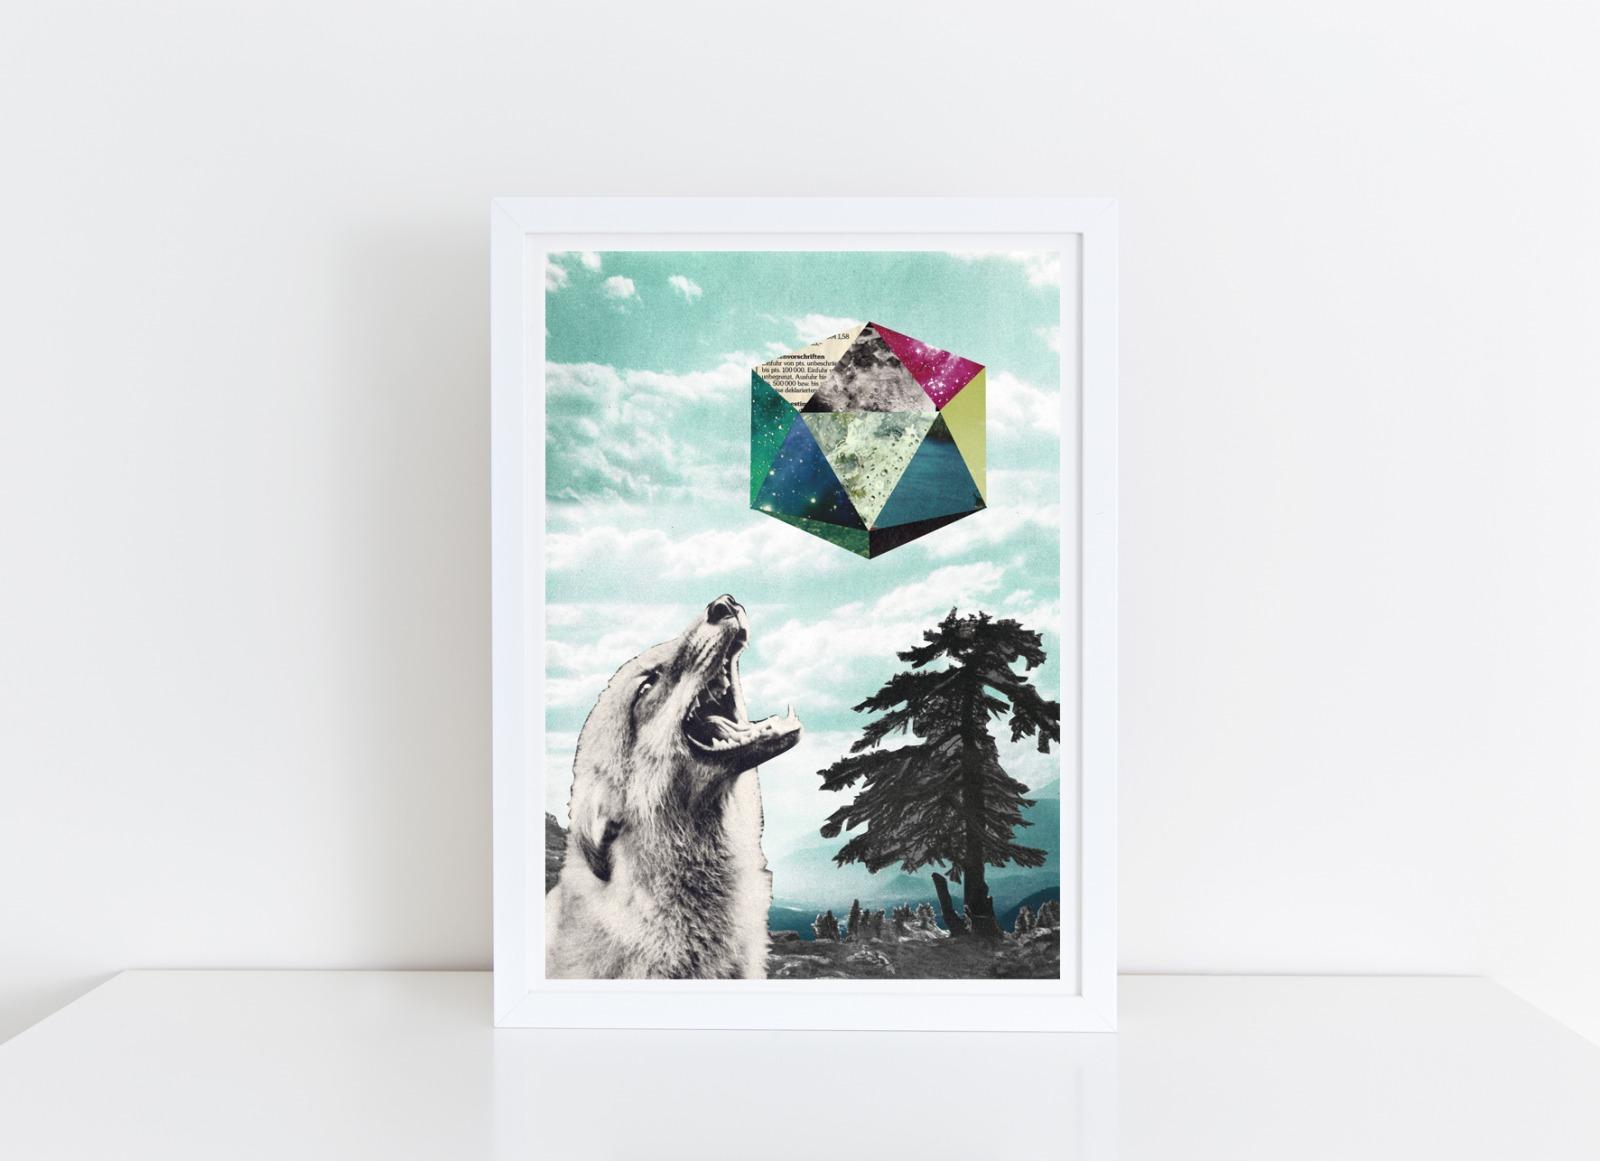 Mondsuechtig Collage Poster Kunstdruck A4